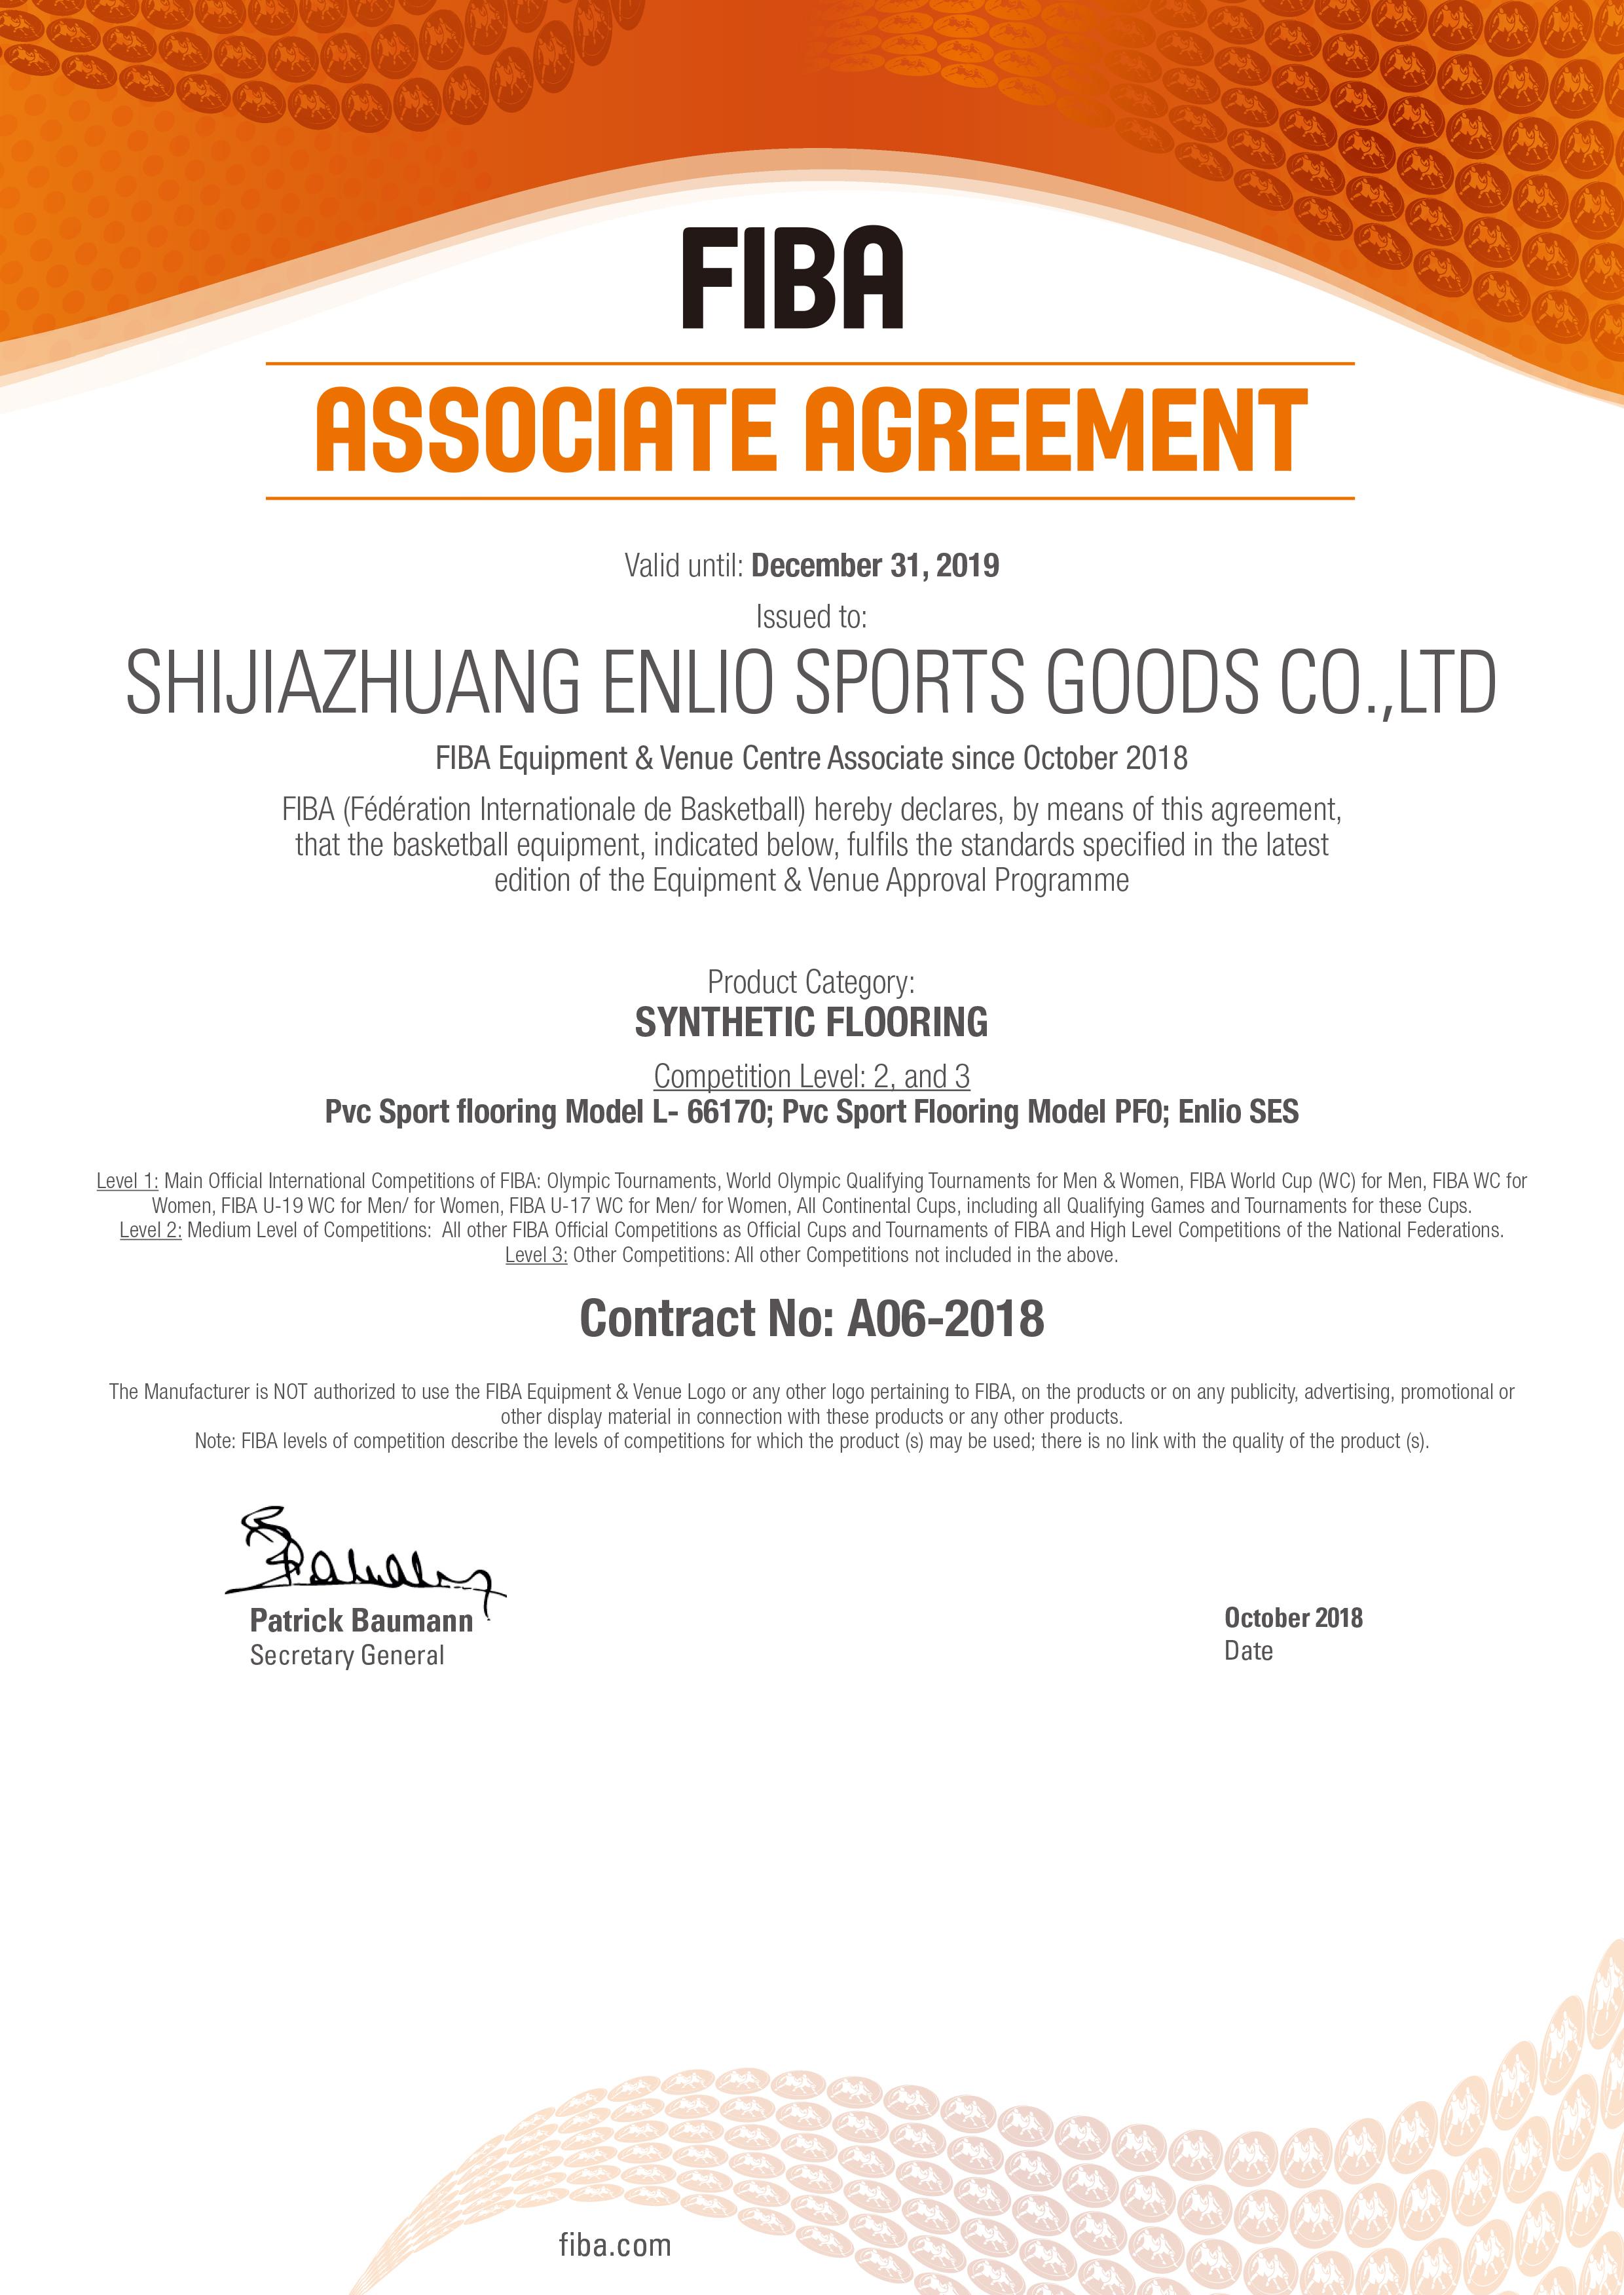 Shijiazhuang Enlio 2019